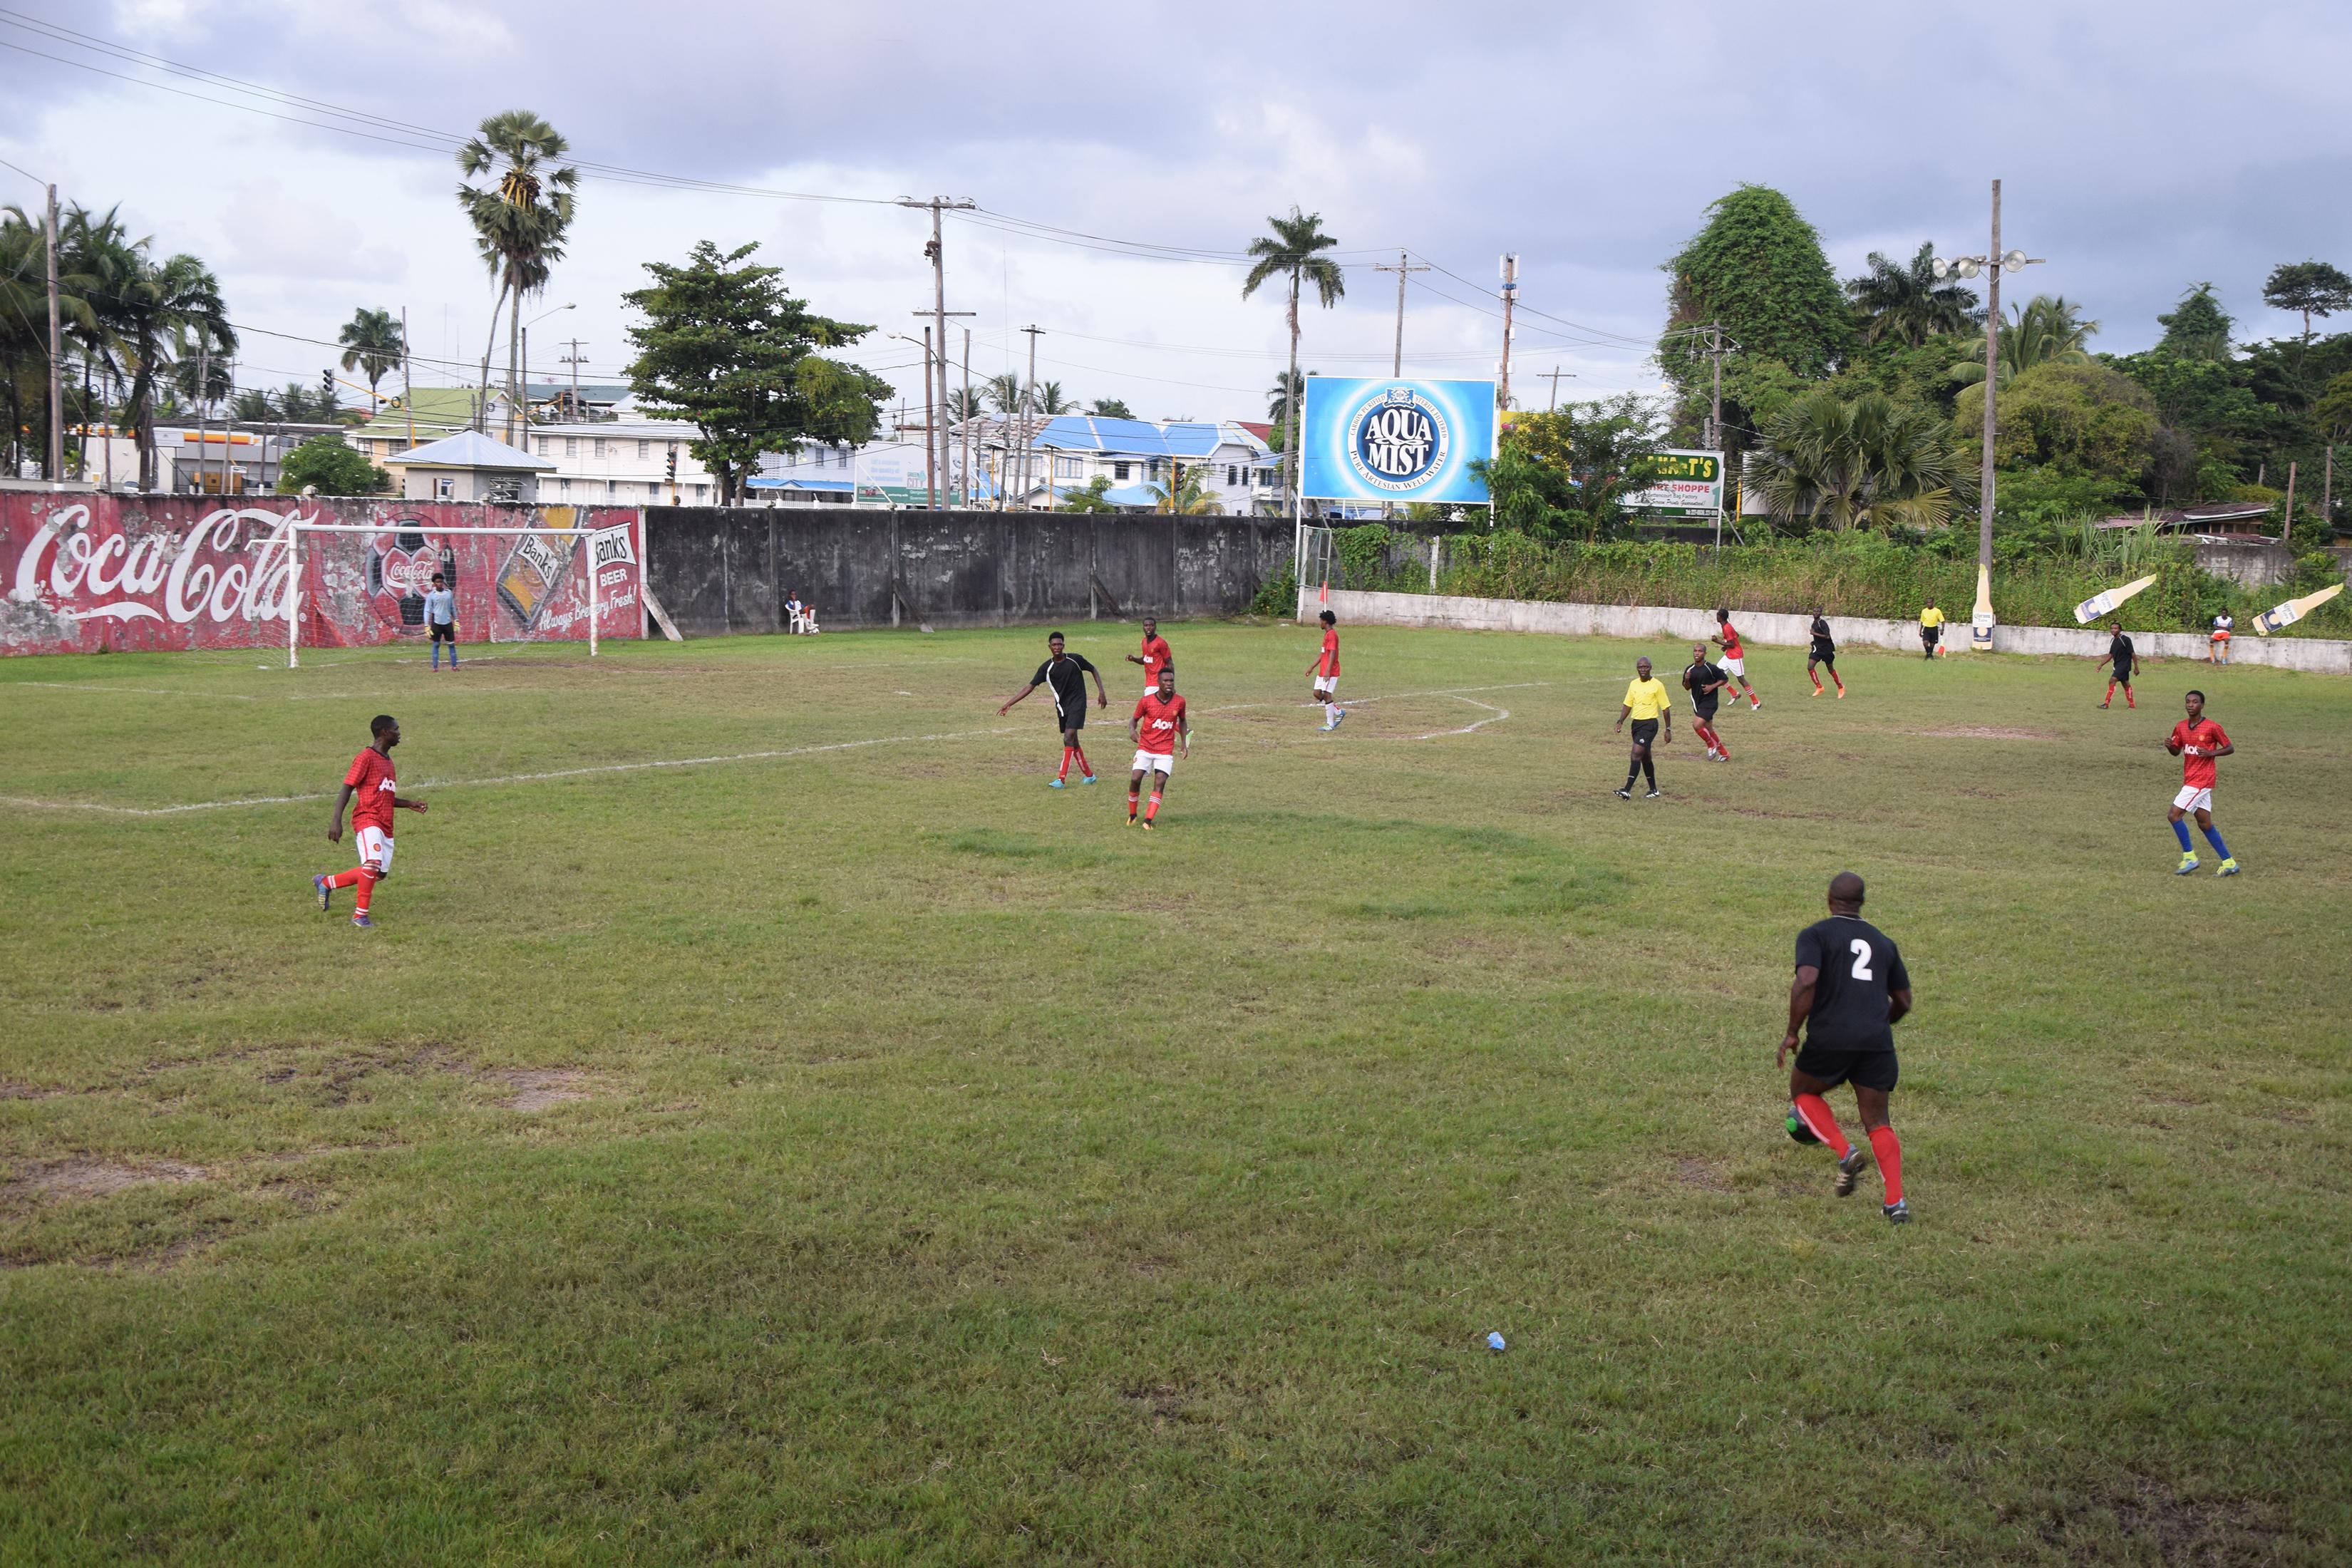 Gfc Whips Gpf 3-0 In Corona Beer Invitational Football Tournament photo